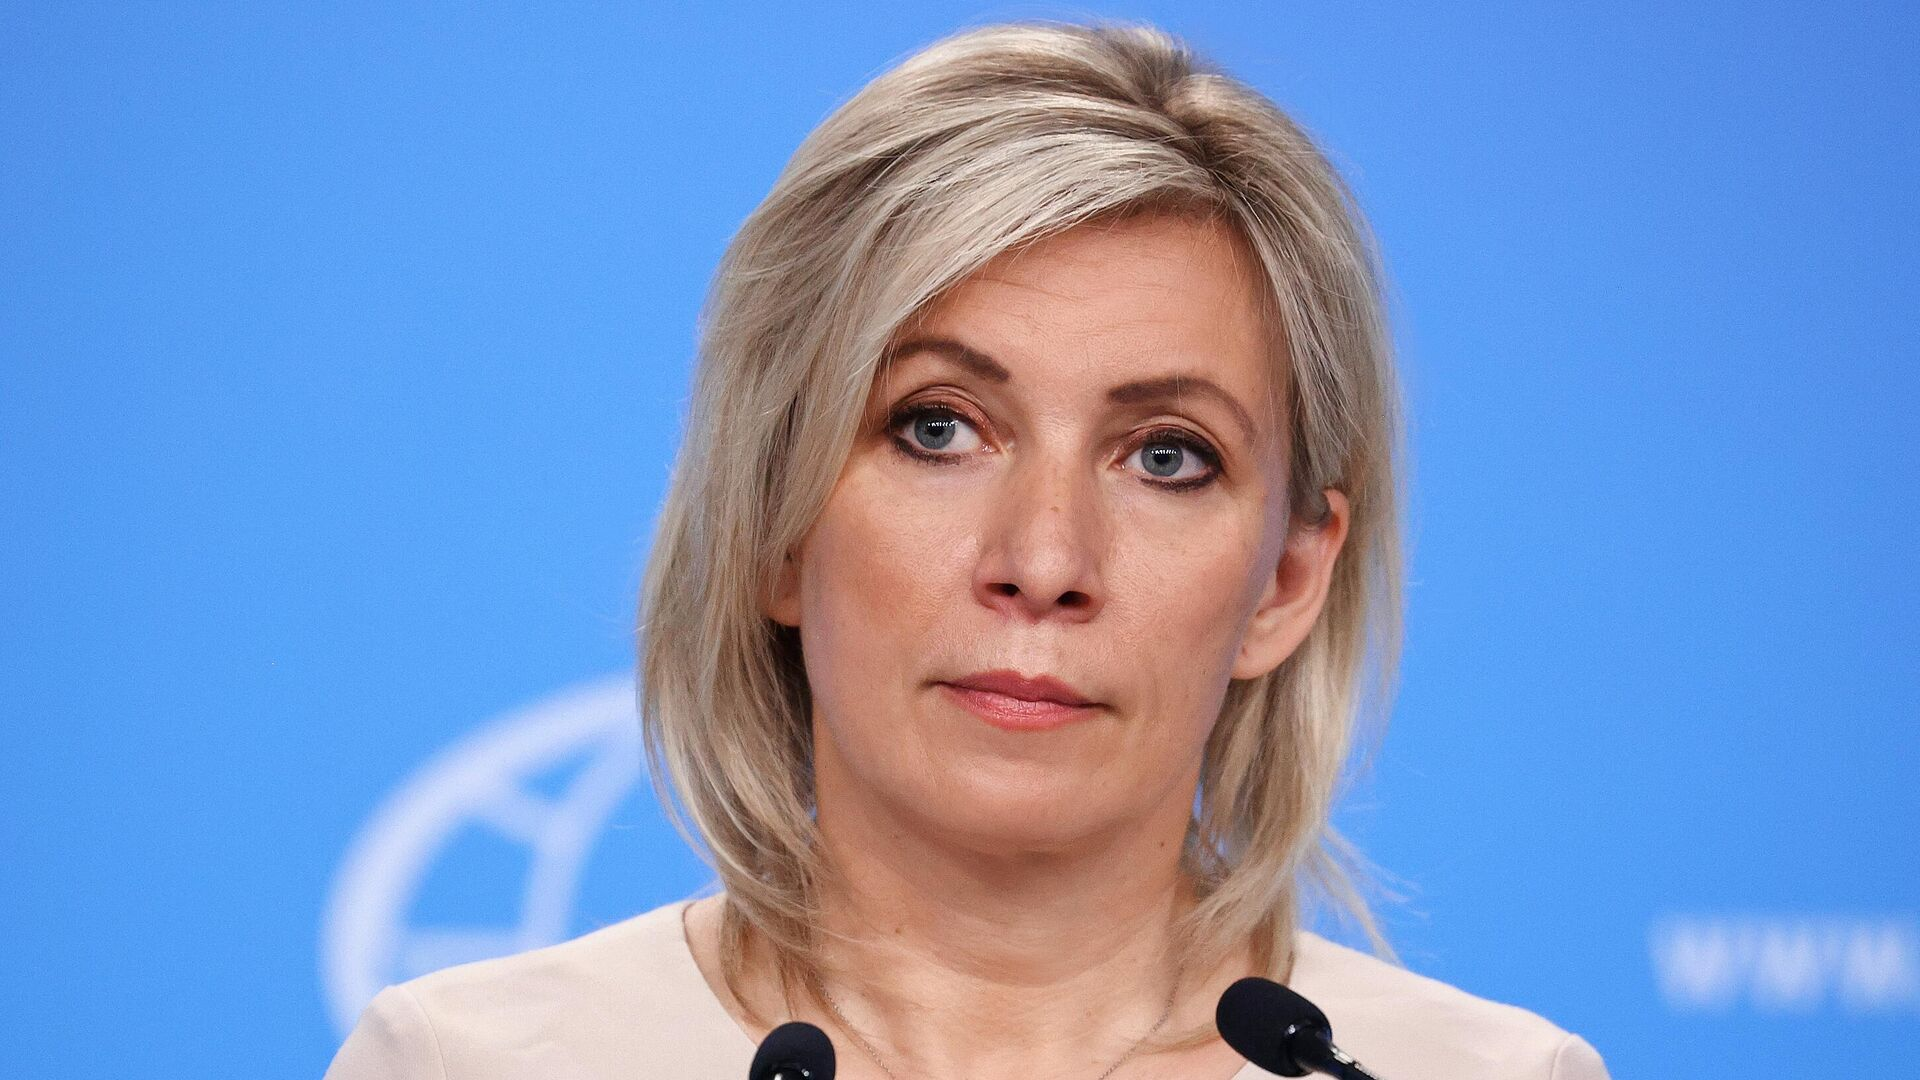 Захарова ответила на слова генсека НАТО о сотрудничестве Москвы и Минска